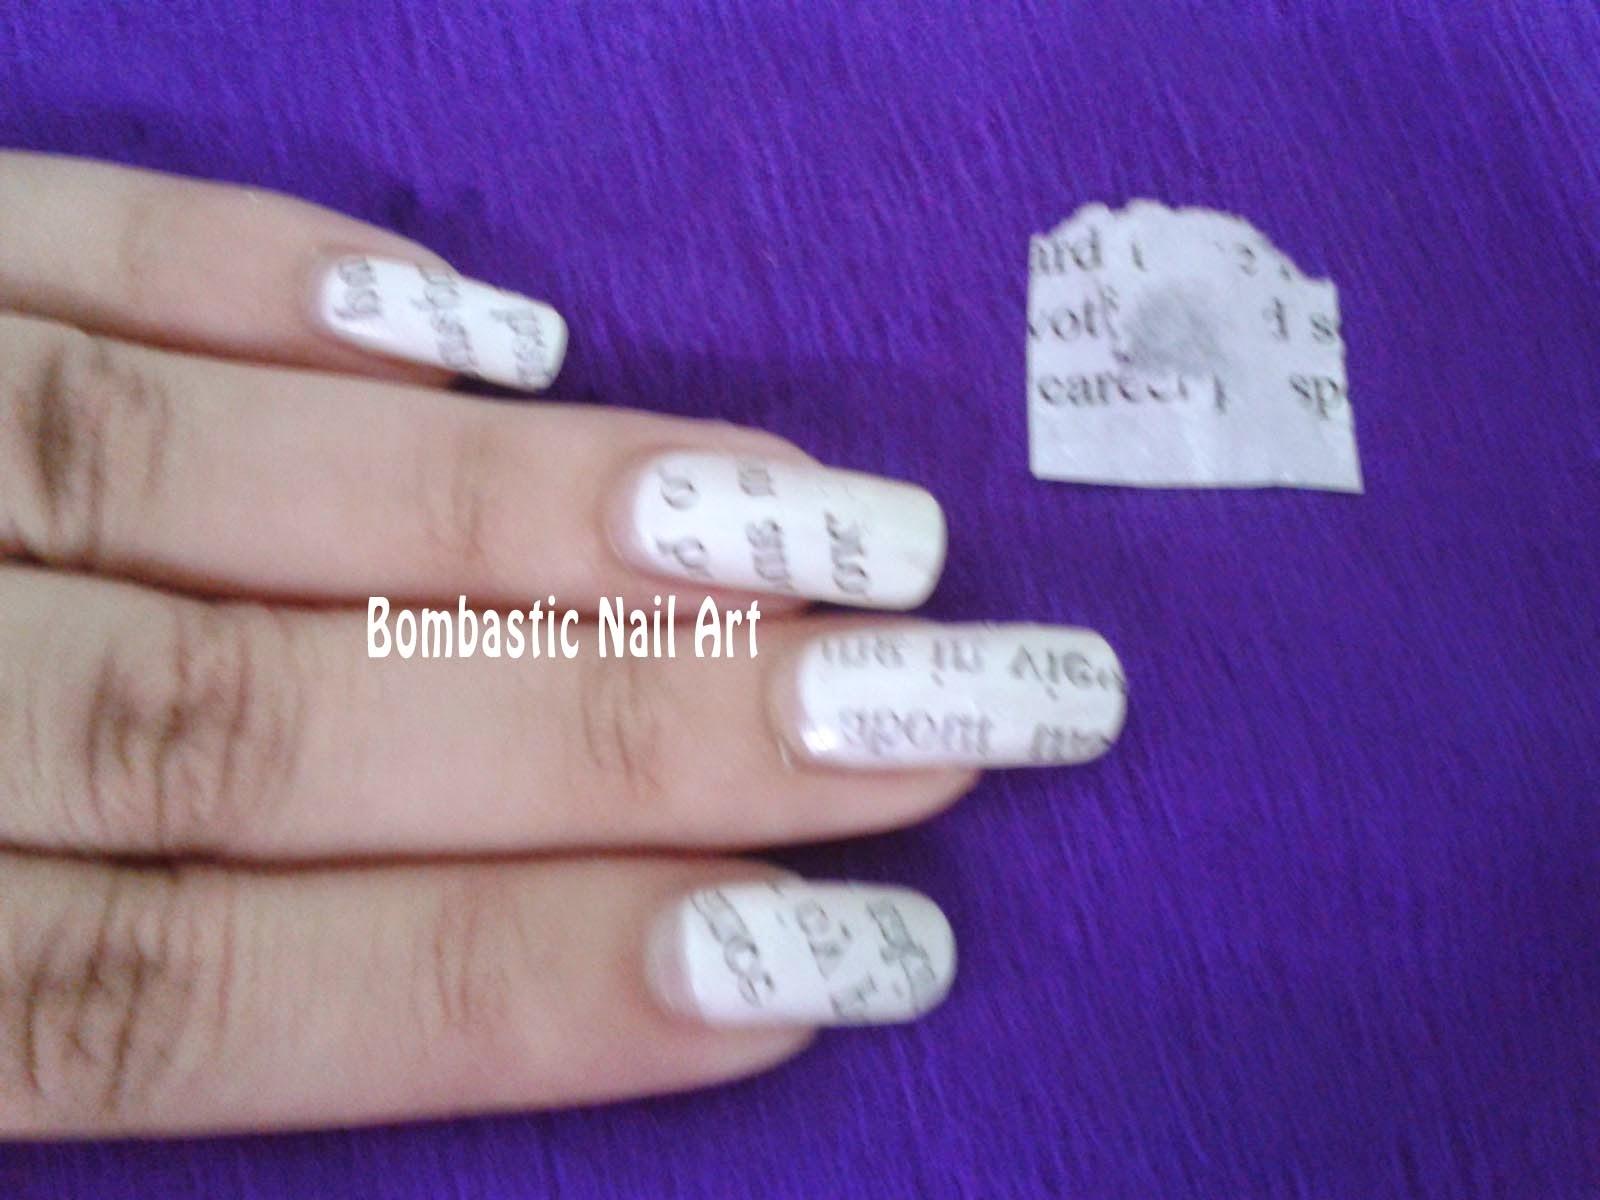 Day 25: Newspaper Nails – Bombastic Nail Art